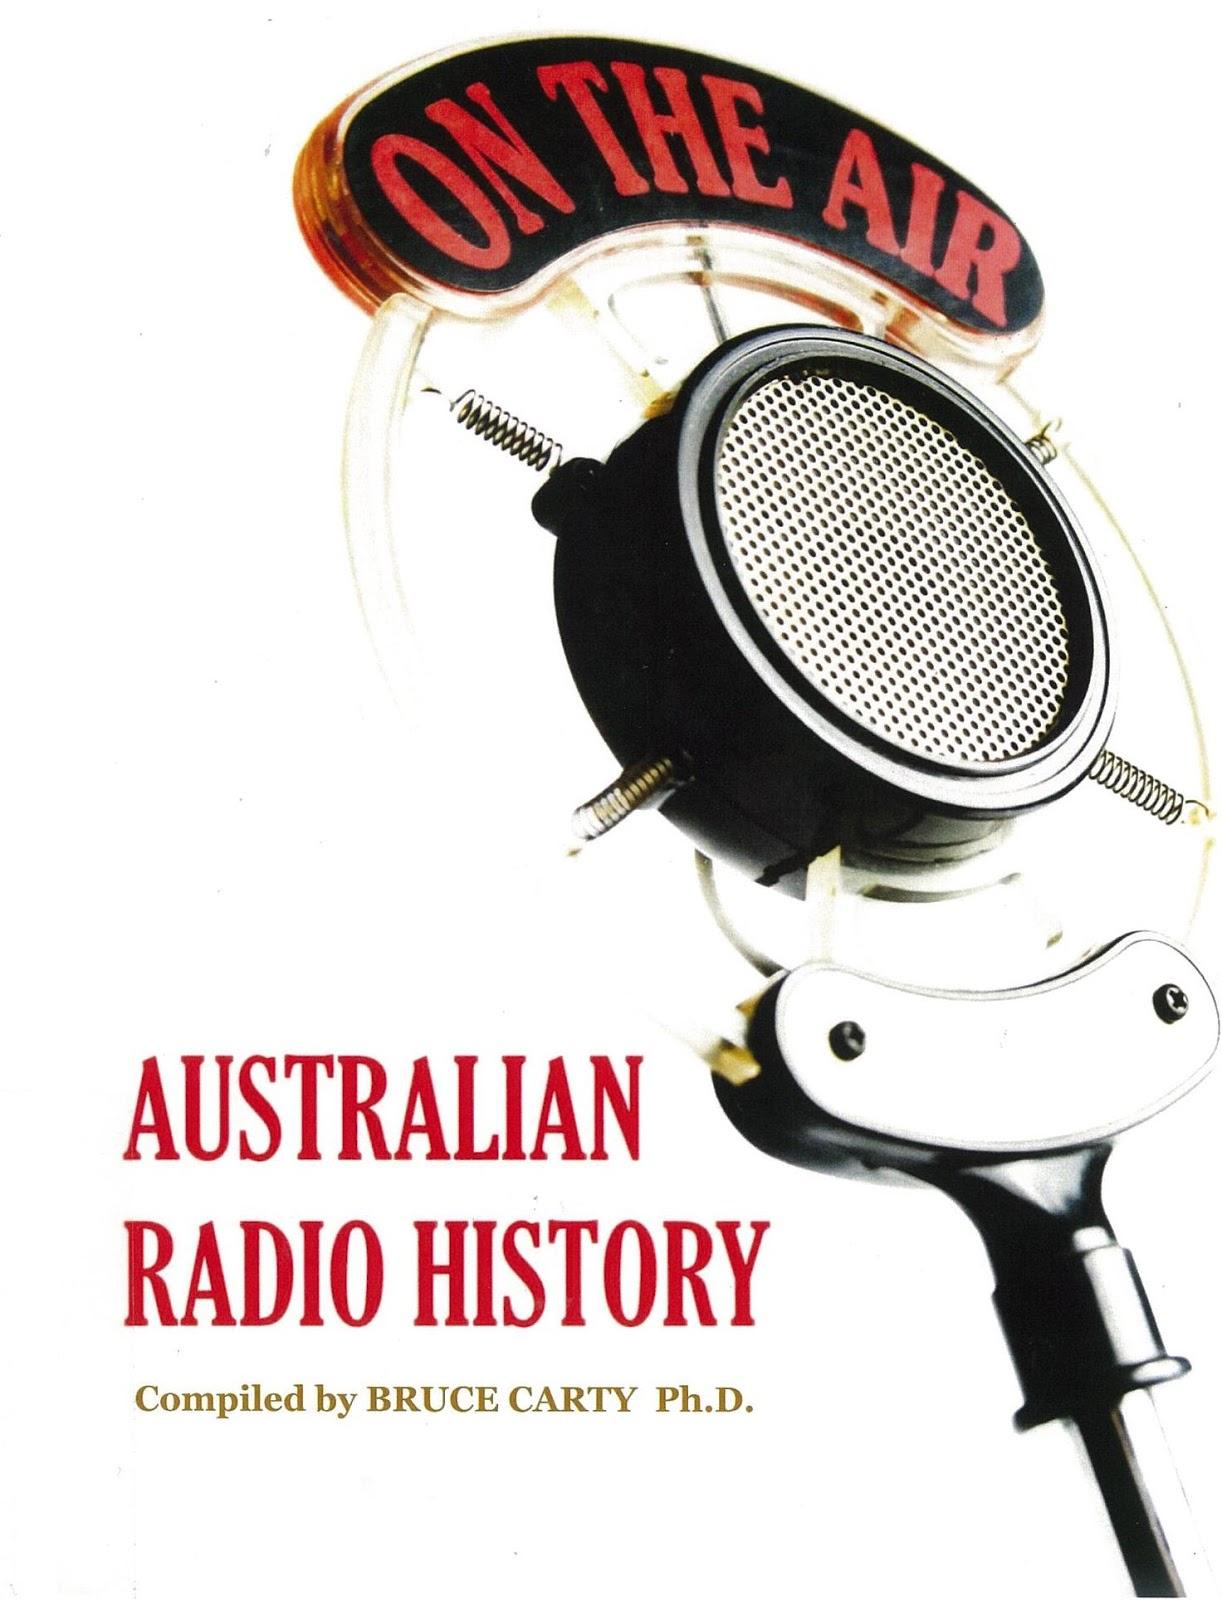 Radio Station Logos Australian radio stations